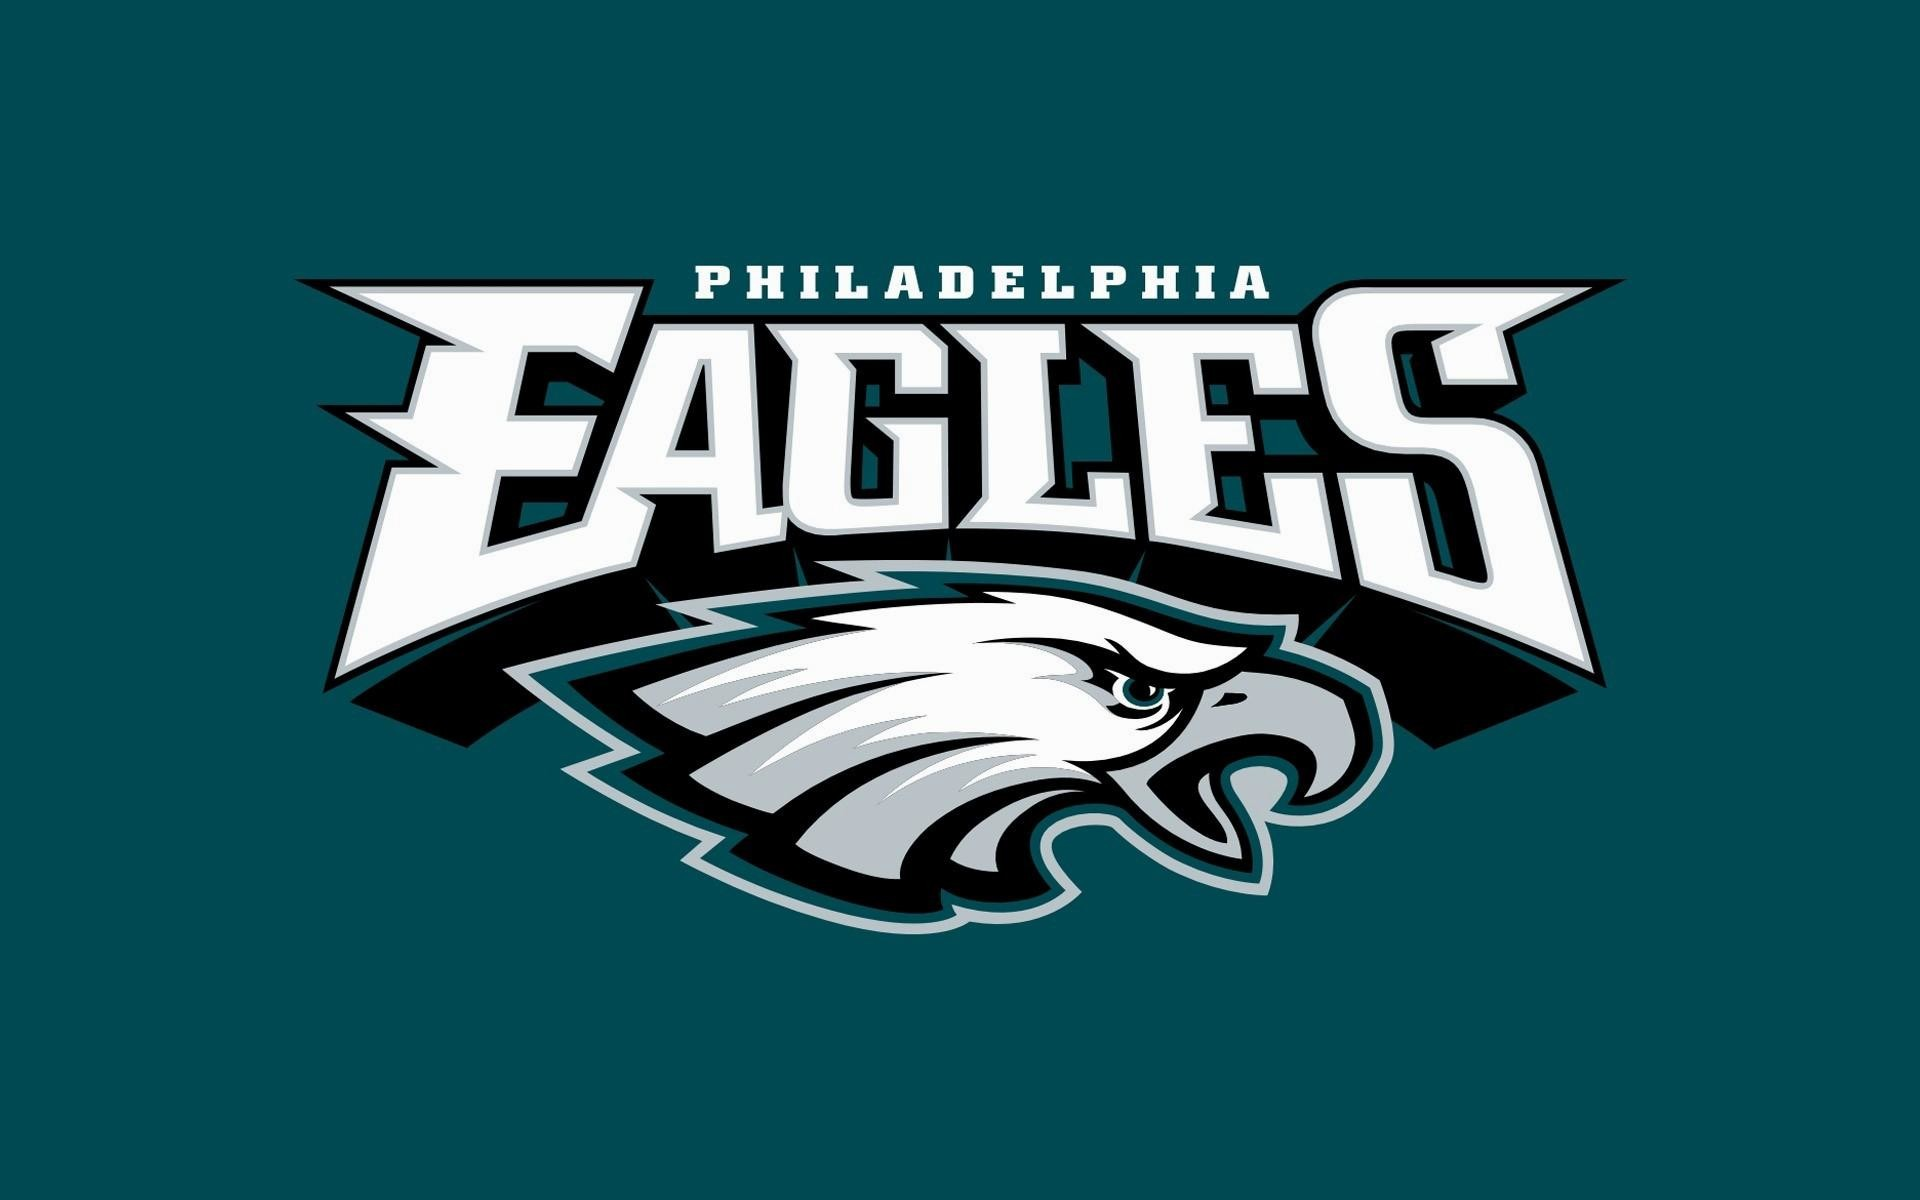 wallpaper.wiki-Philadelphia-Eagles-Wallpaper-PIC-WPE001976